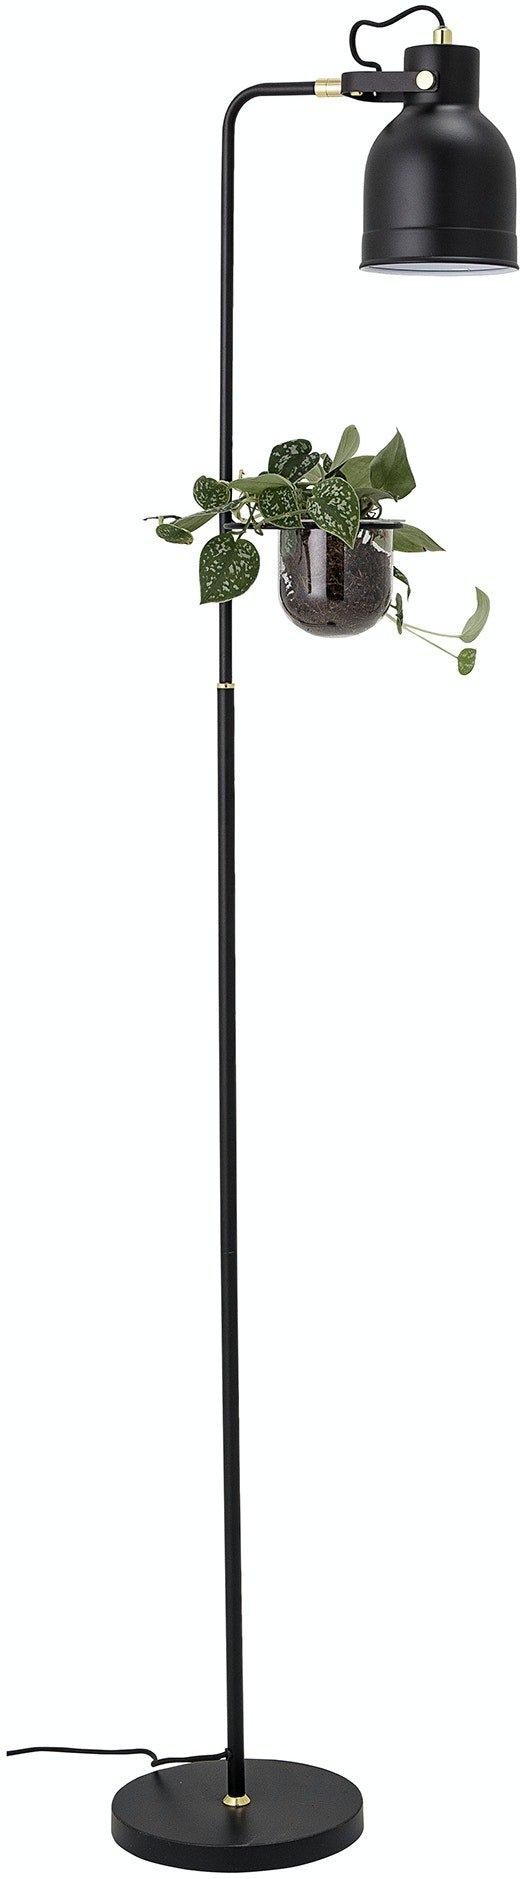 Køb Agnete, Gulvlampe, Sort, Metal by Bloomingville (H: 158 cm. B: 33 cm. L: 23 cm., Sort)